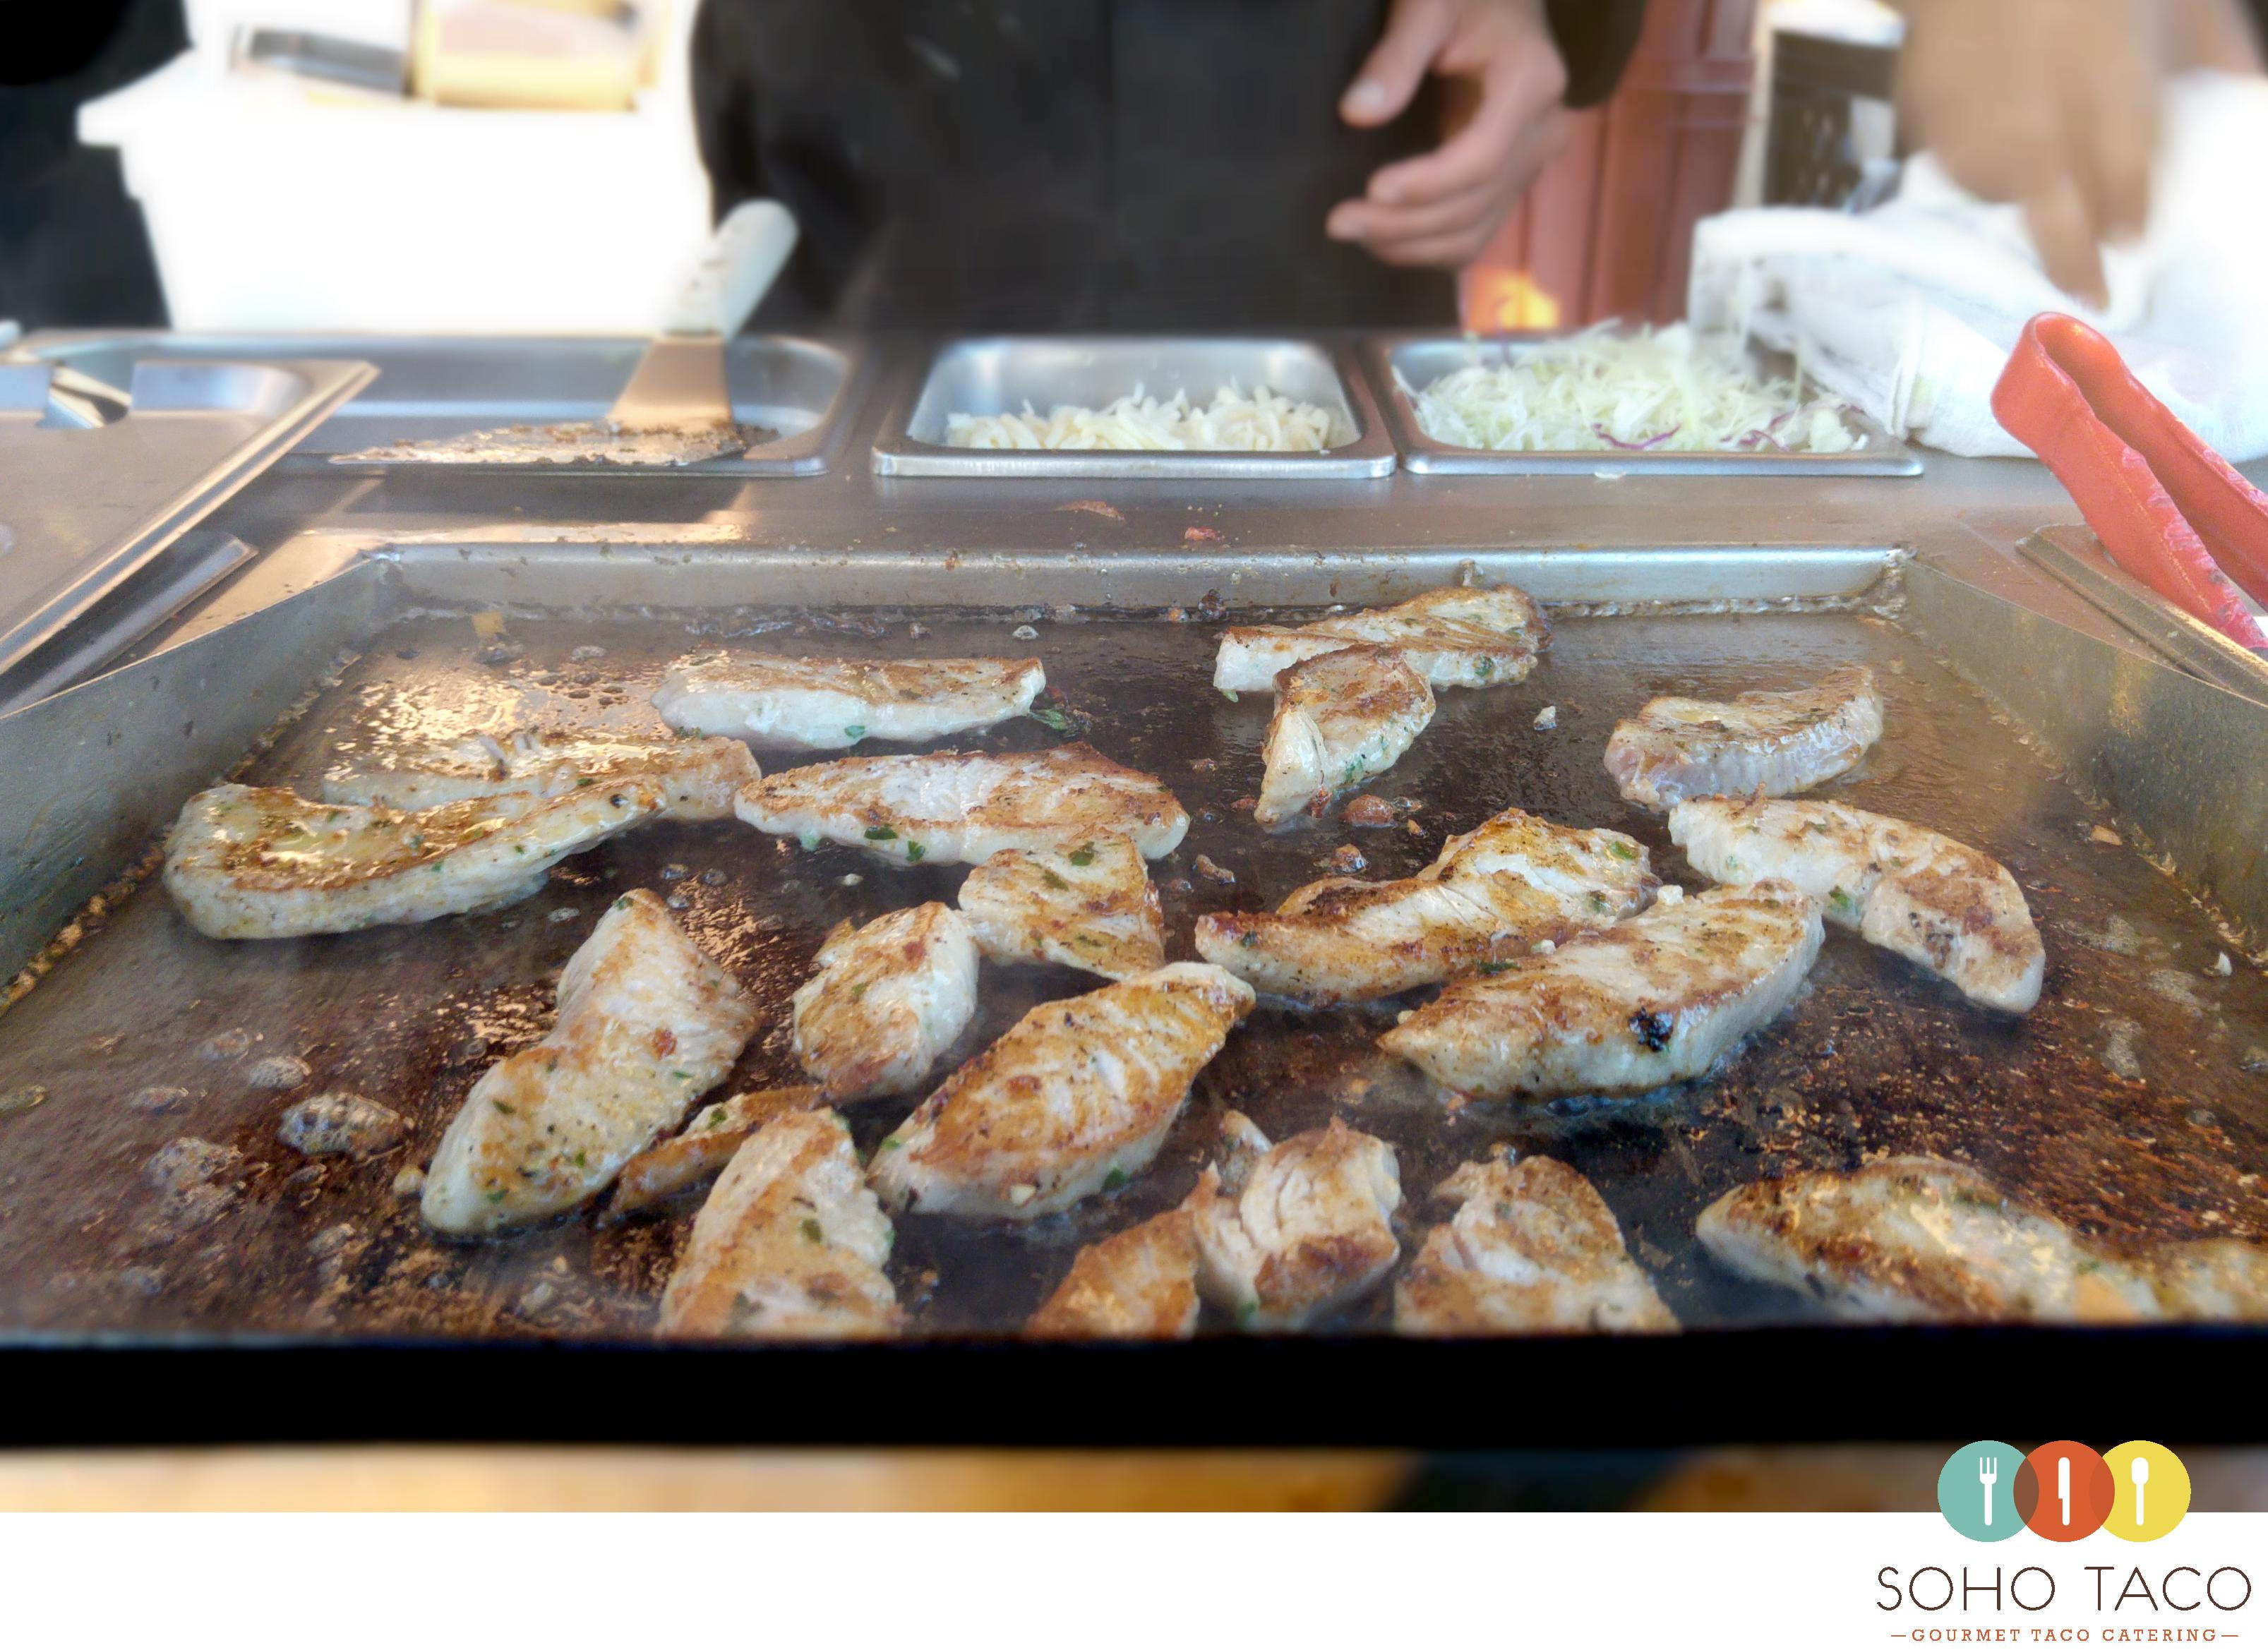 SOHO TACO Gourmet Taco Catering - Sunset Beach - Wedding - Mahi Mahi - Orange County - OC